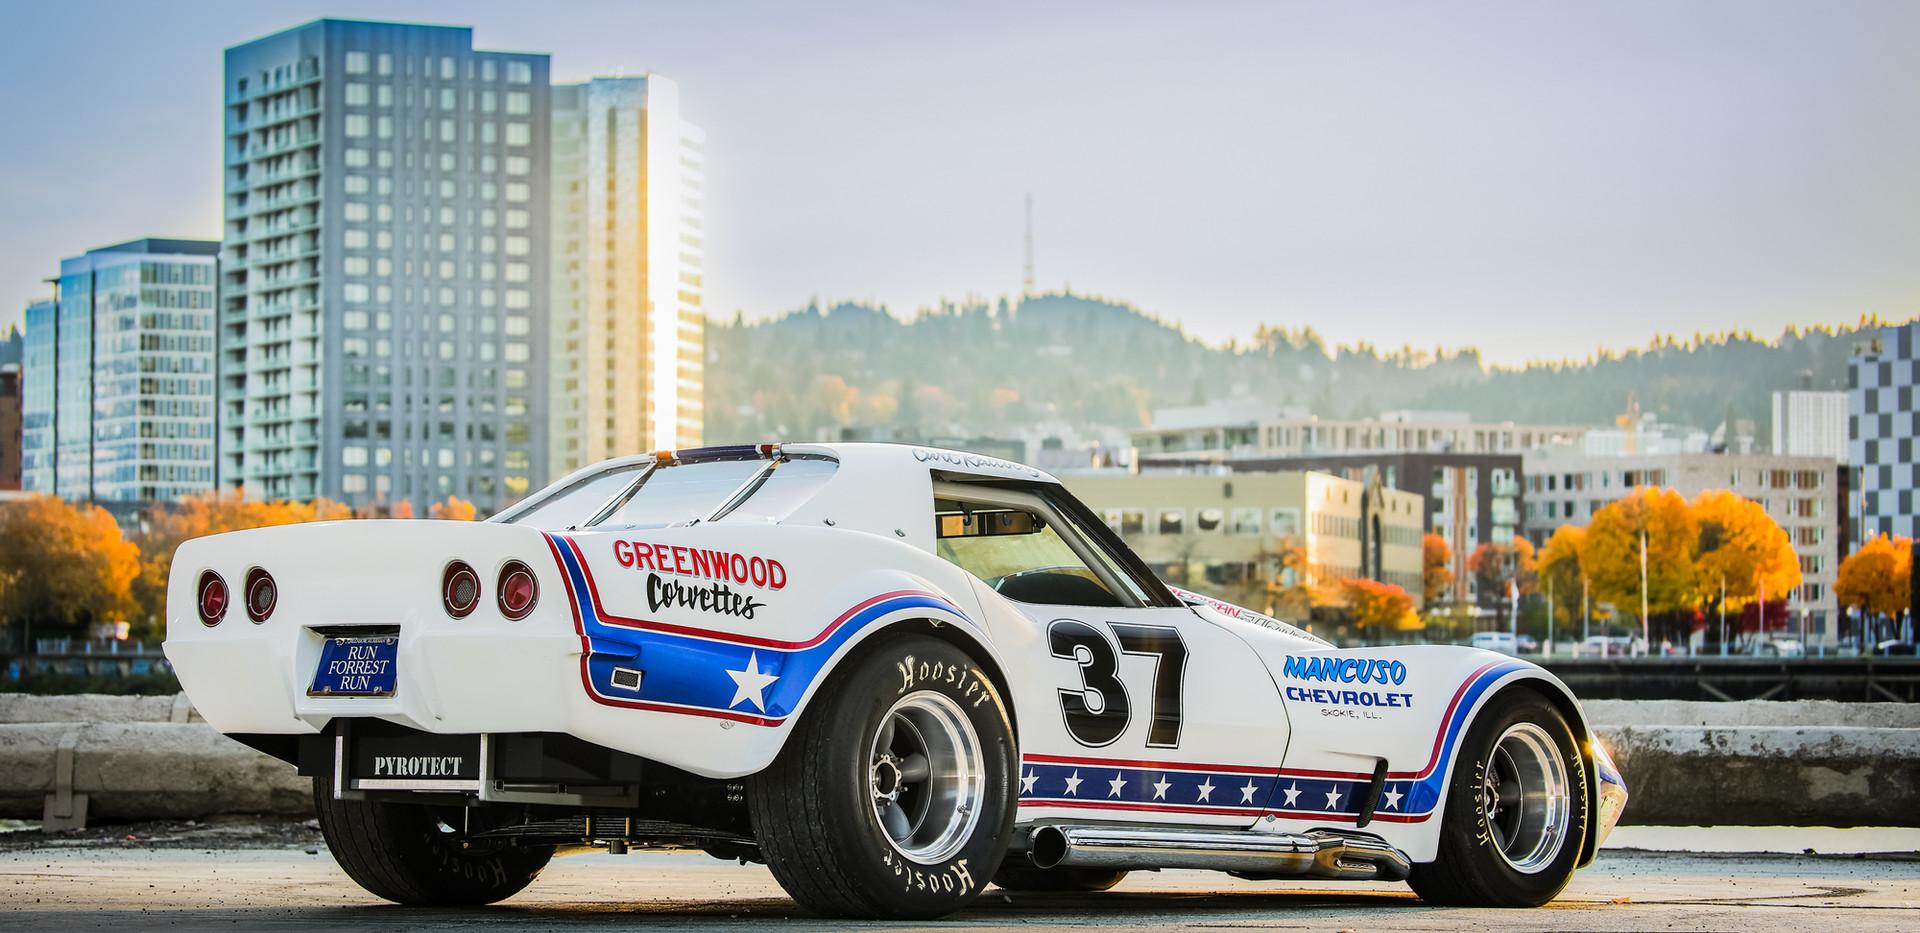 The Image Engine Vintage Racing Corvette